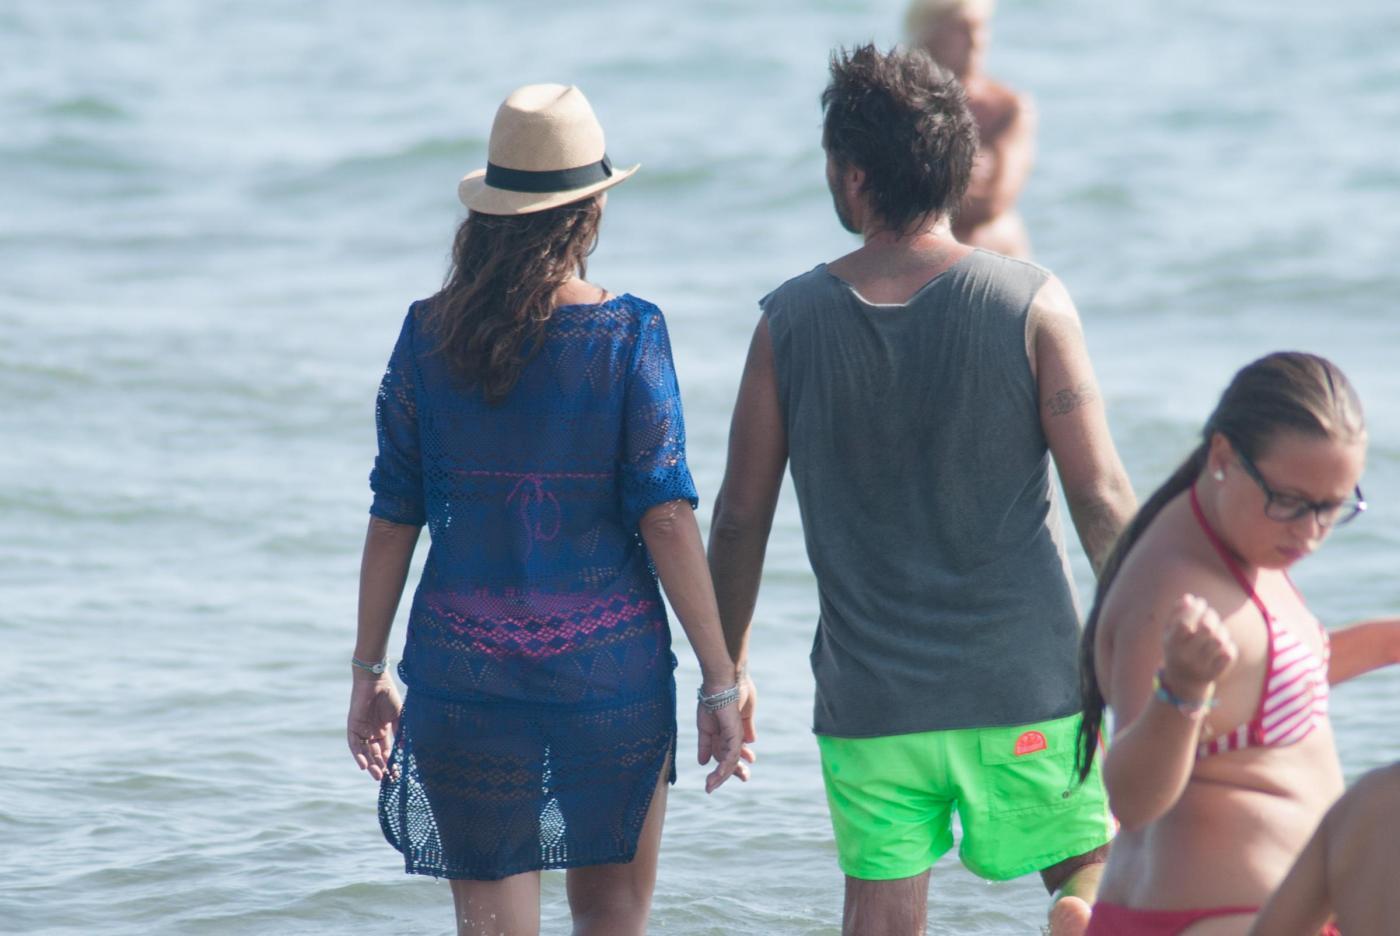 Nek e la moglie Patrizia Vacondio a Marina di Pietrasanta FOTO 15